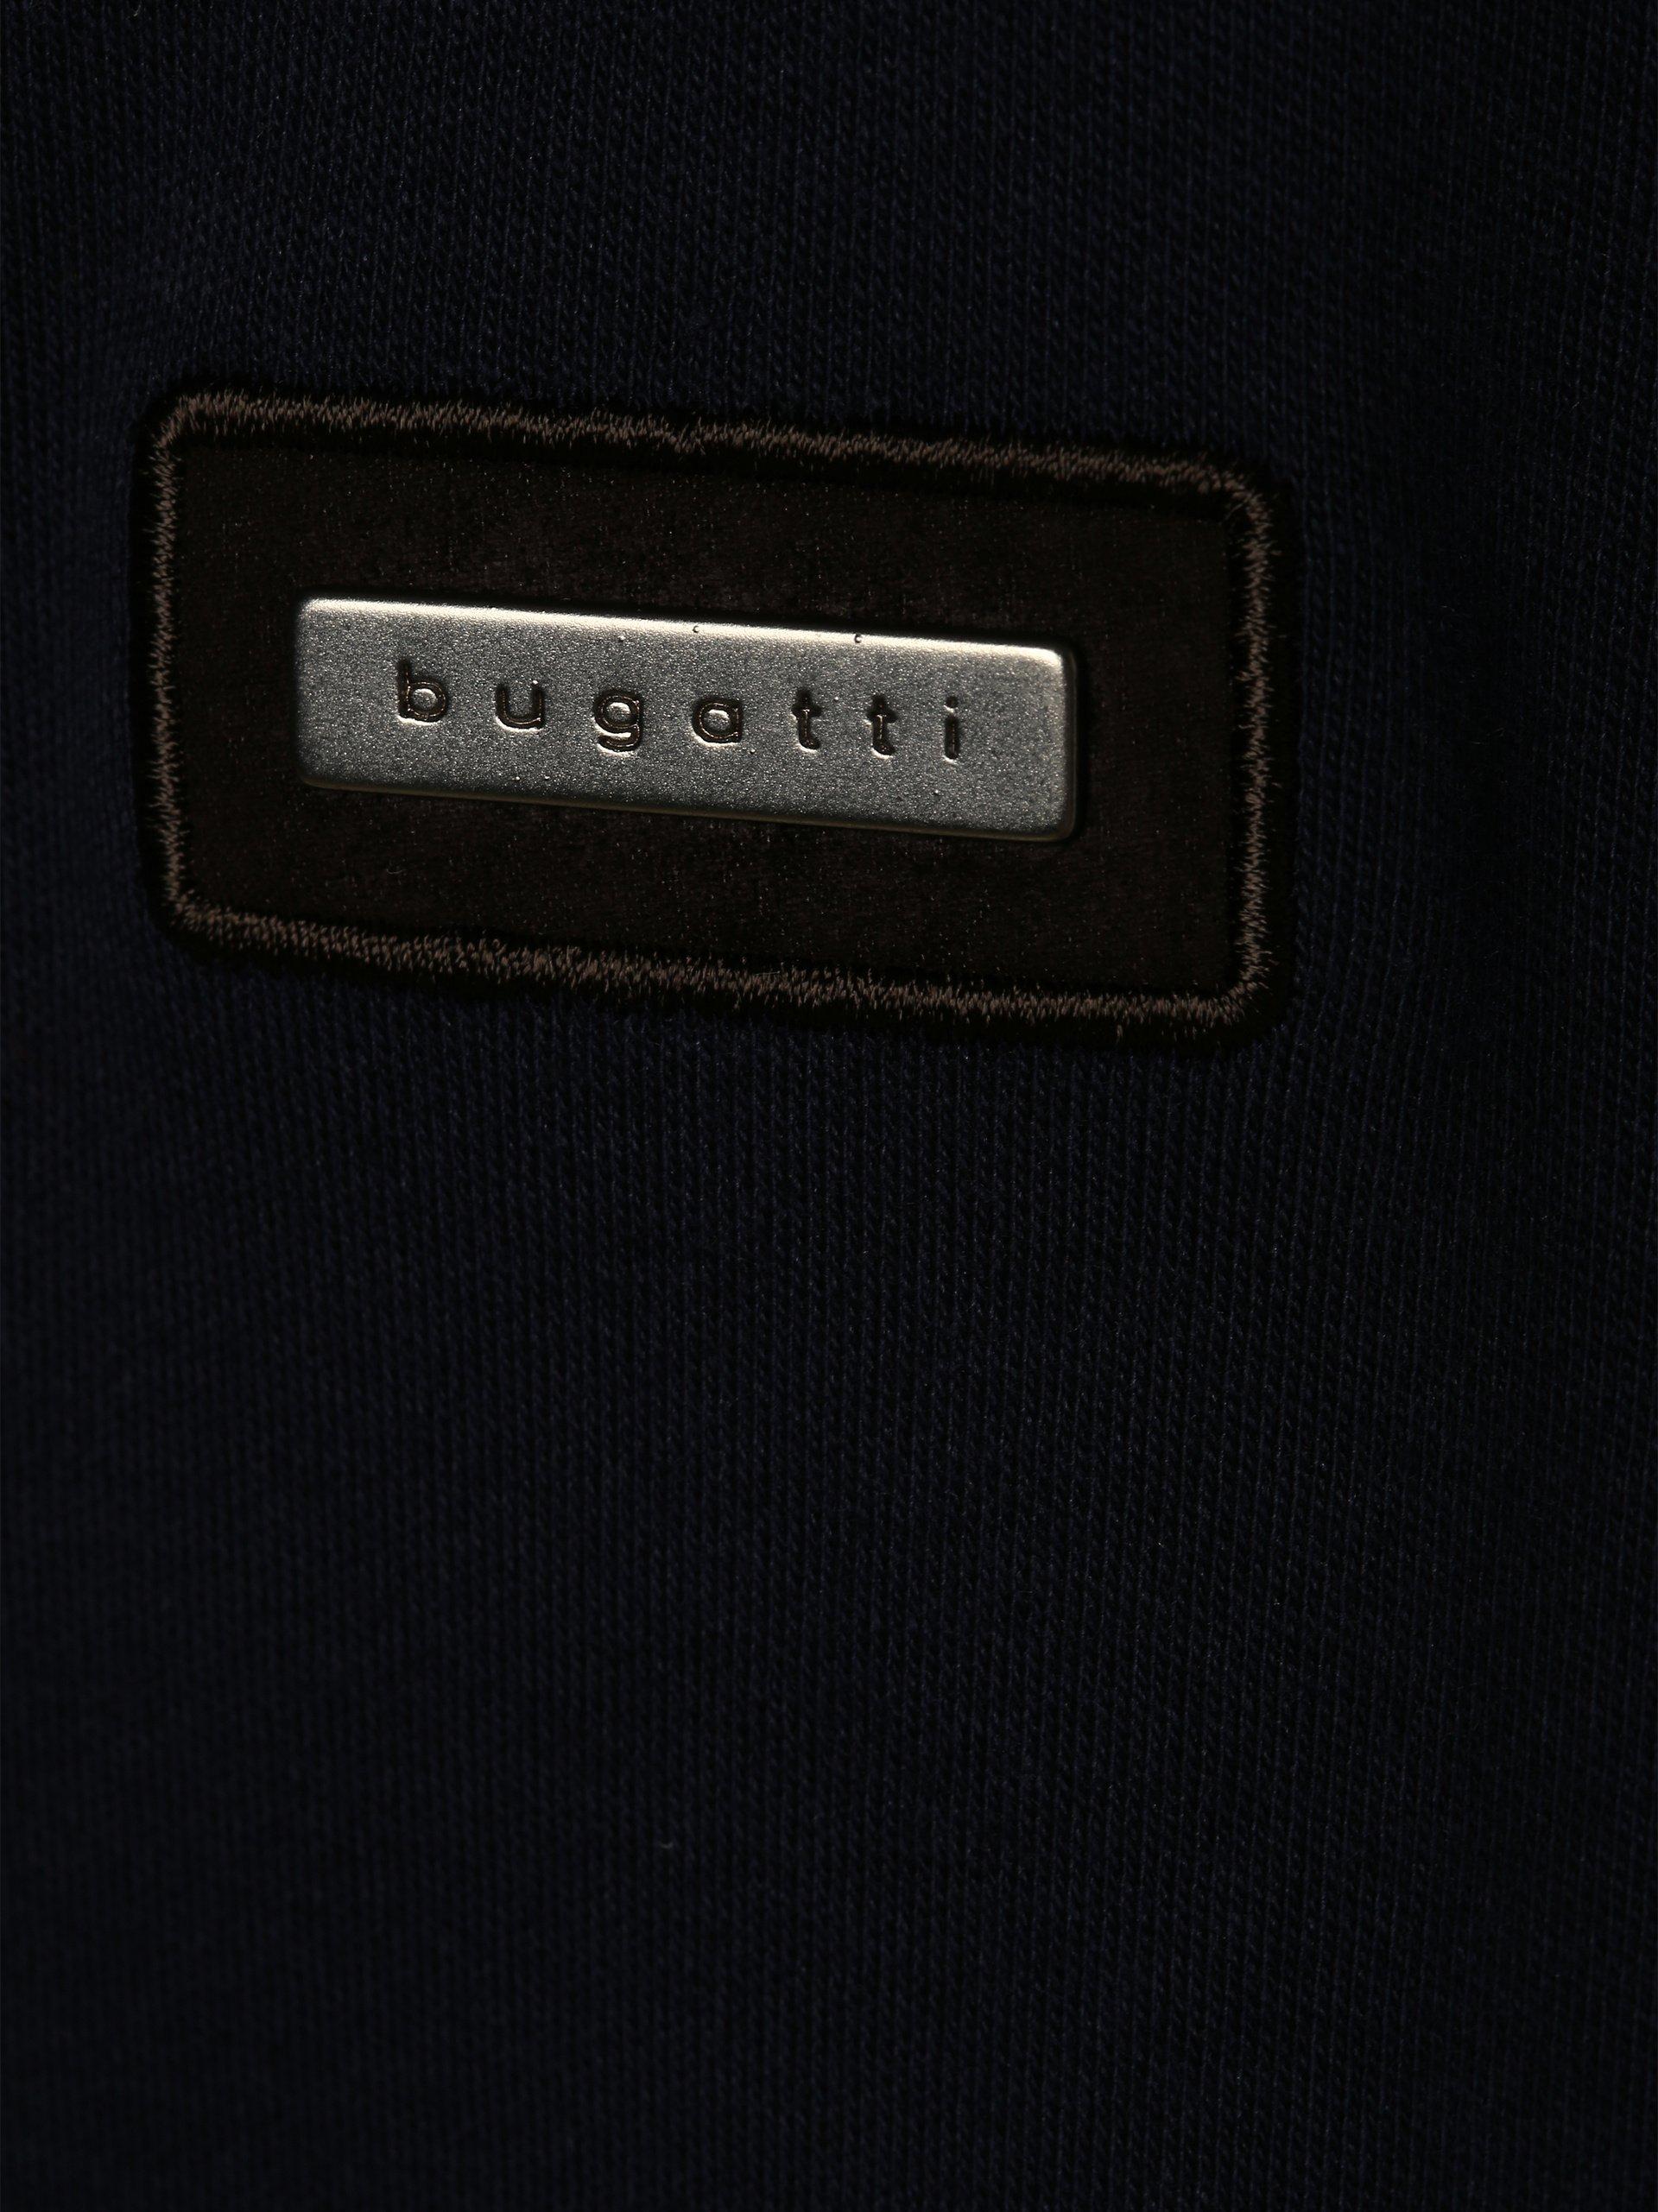 Bugatti Herren Sweatjacke